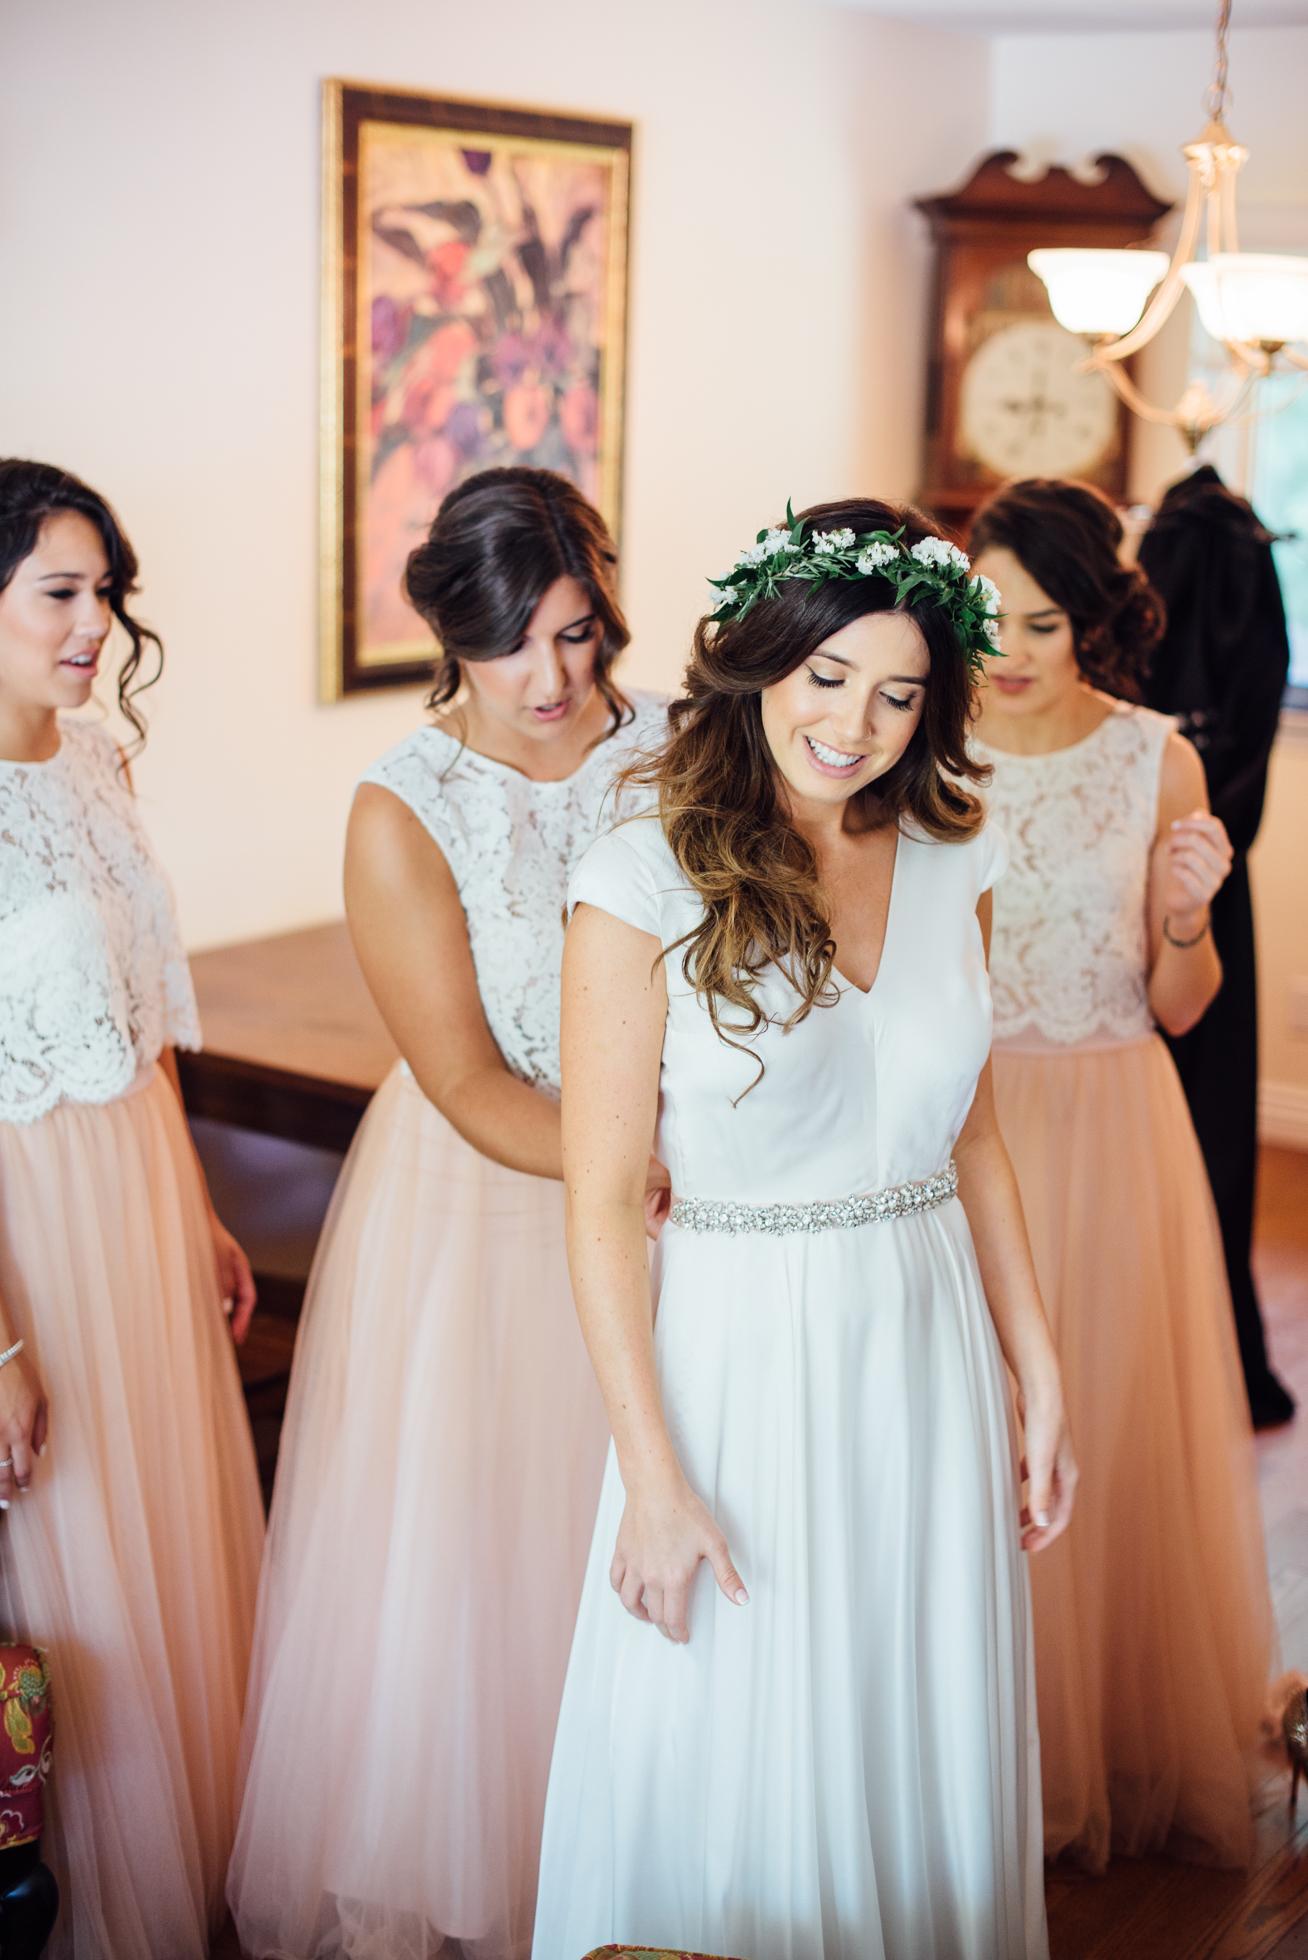 Downswell-Barn-Wedding-Photography-13.jpg